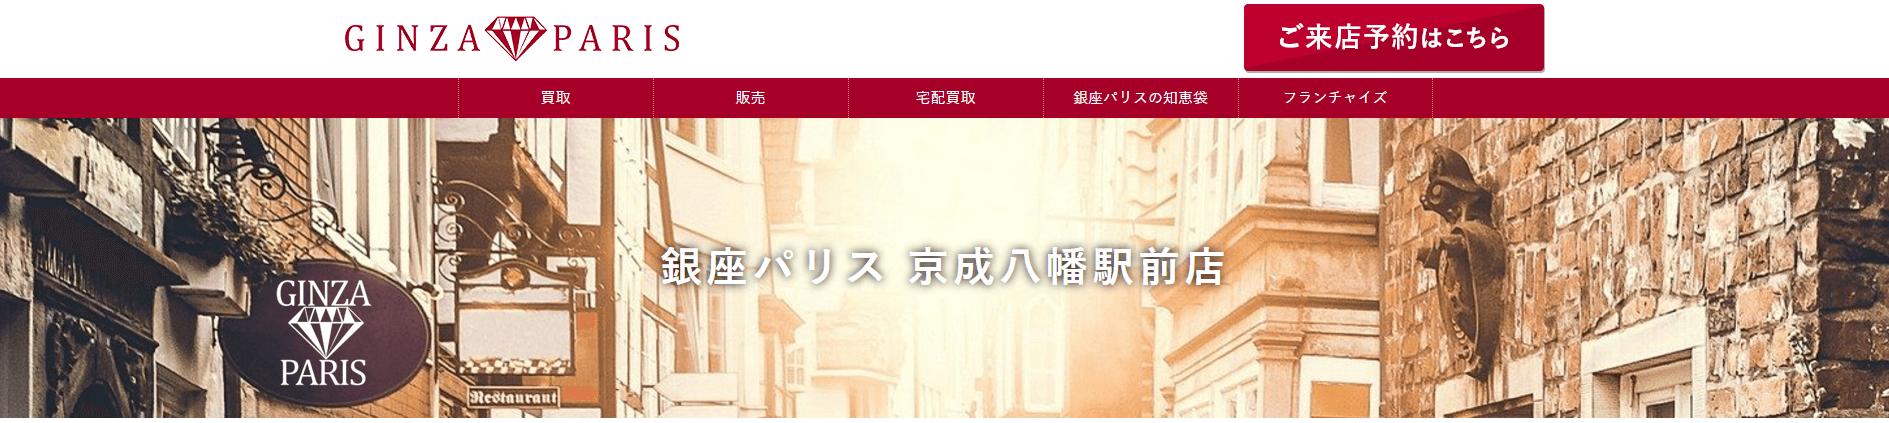 銀座パリス京成八幡駅前店